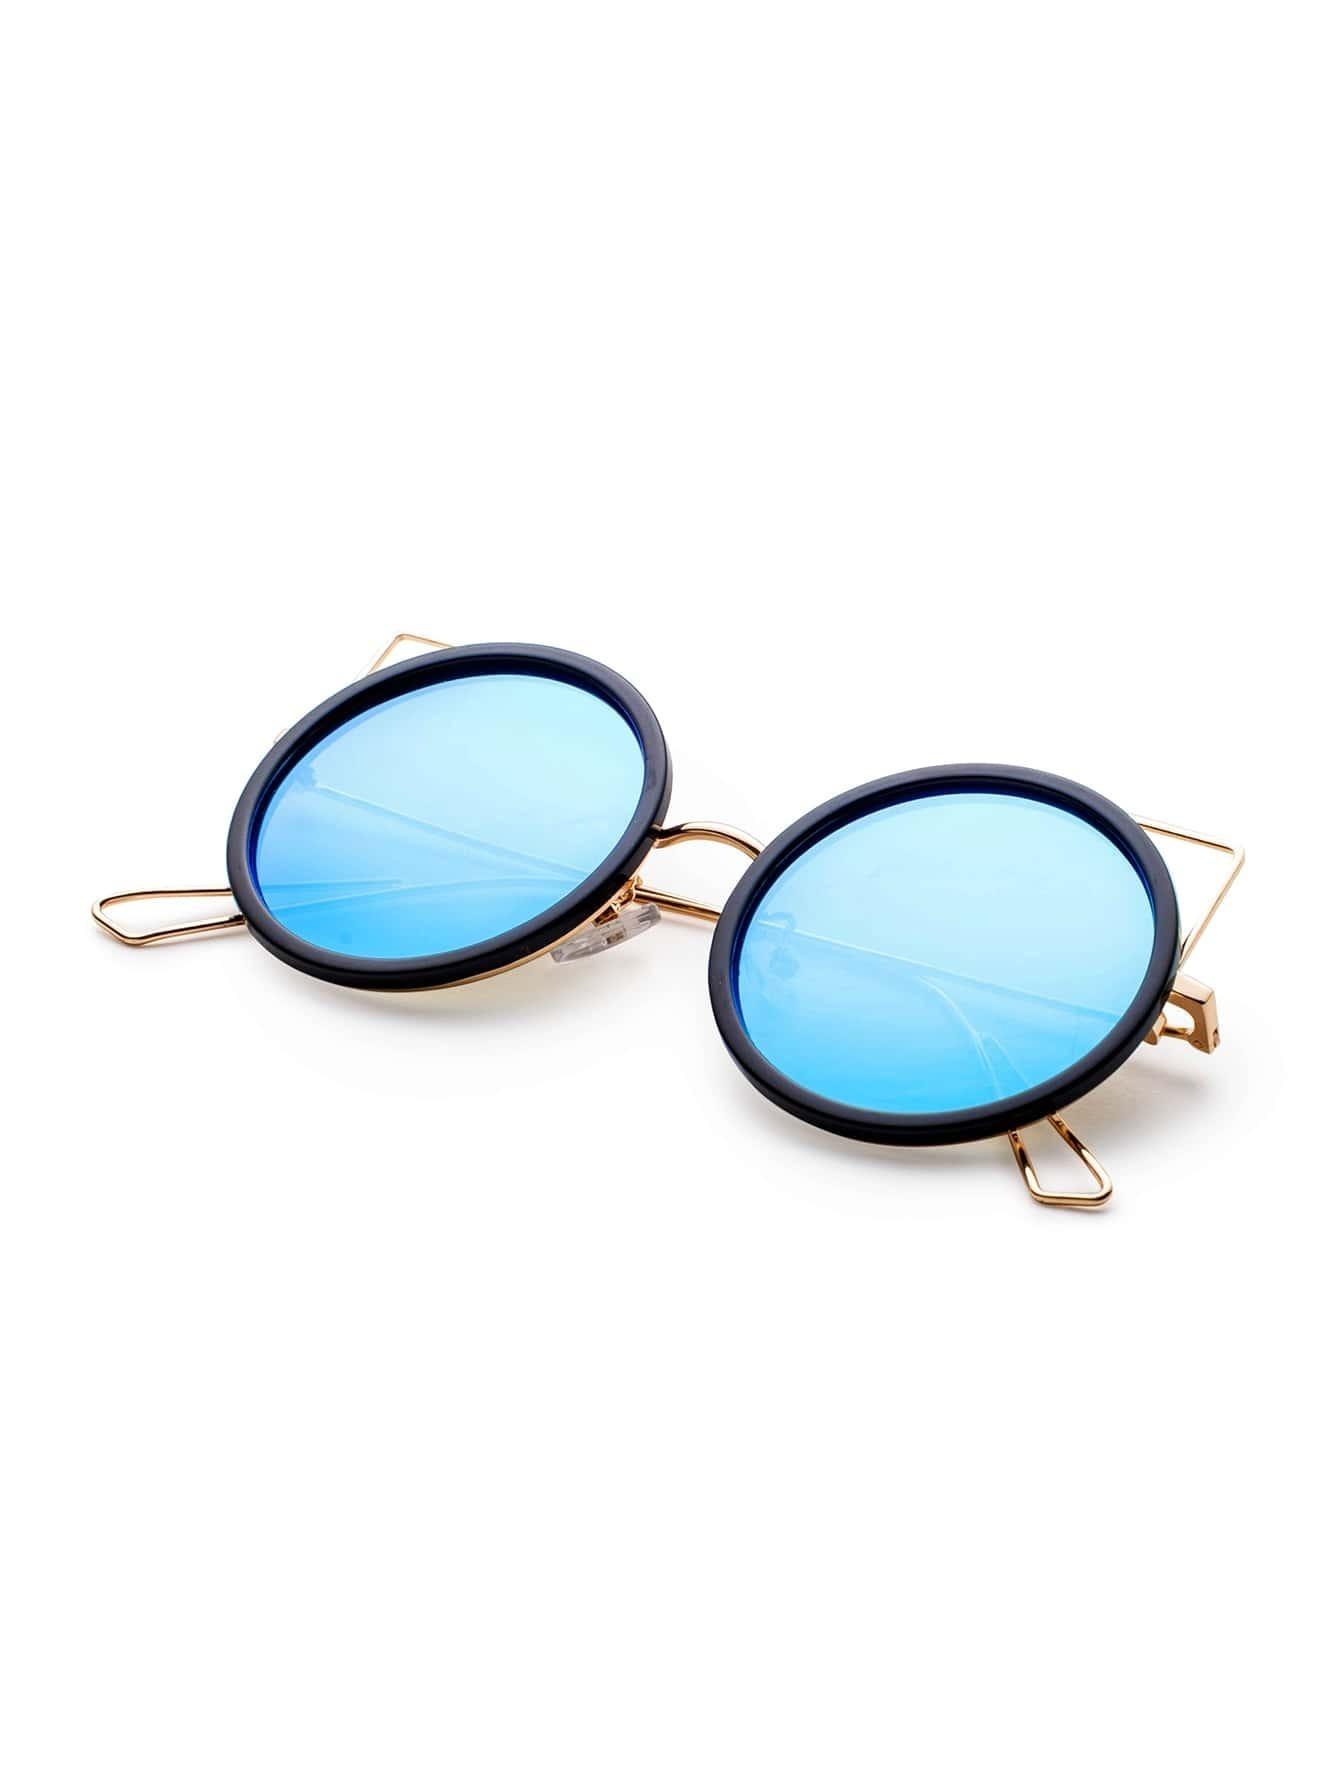 noir et or cadre bleu lunette ronde design lunettes de soleil french romwe. Black Bedroom Furniture Sets. Home Design Ideas